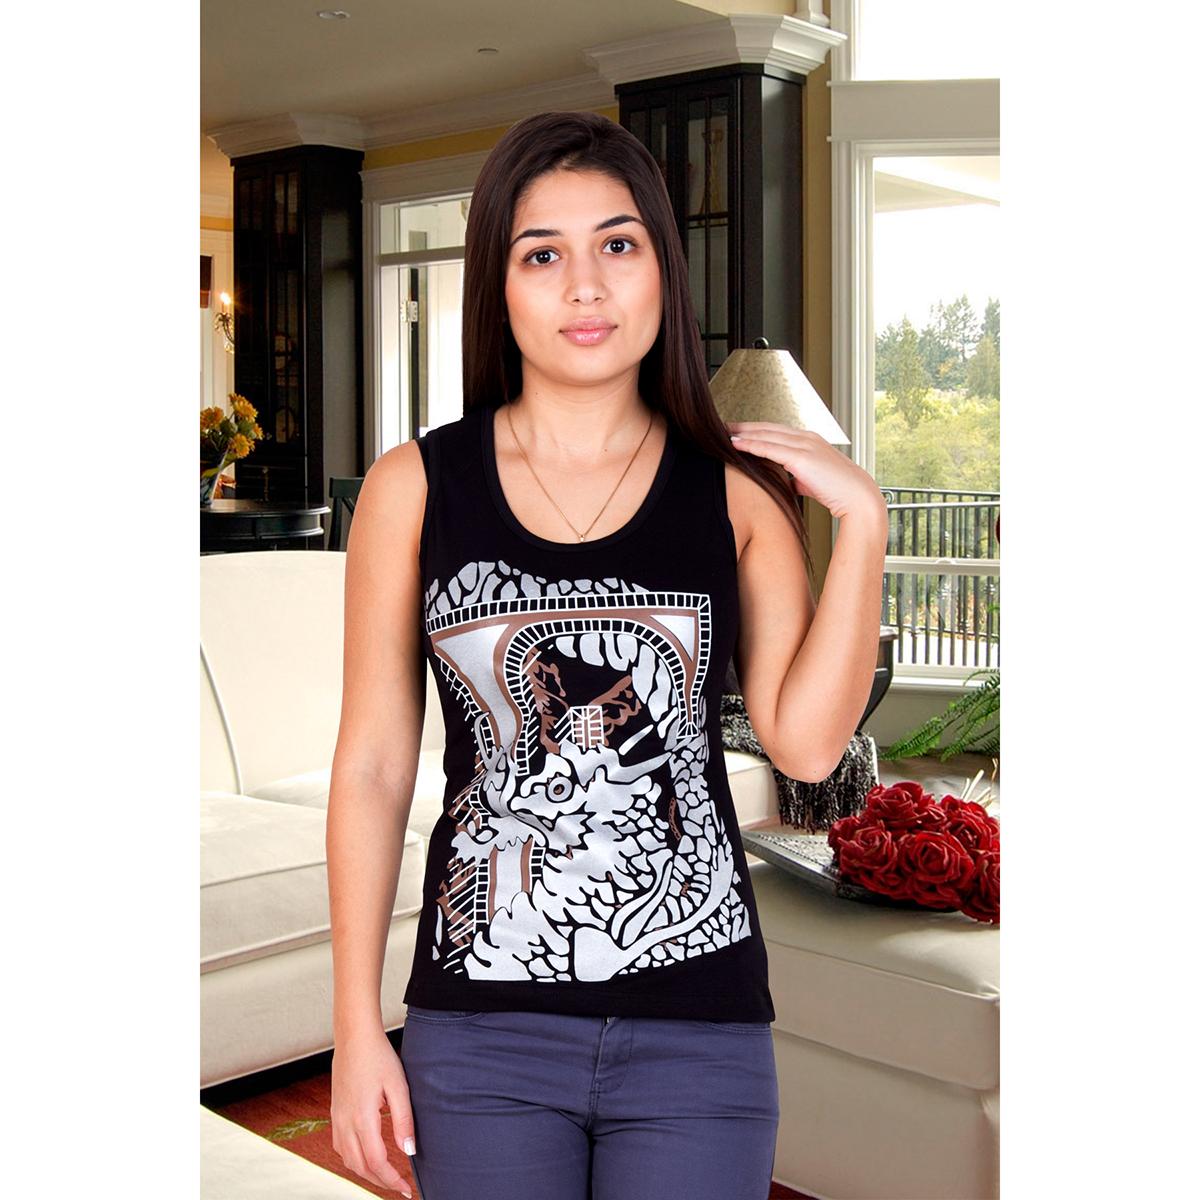 Женская майка Дракон, размер 42Блузки, майки, кофты<br>Обхват груди:84 см<br>Обхват талии:65 см<br>Обхват бедер:92 см<br>Рост:167 см<br><br>Тип: Жен. футболка<br>Размер: 42<br>Материал: Фулайкра